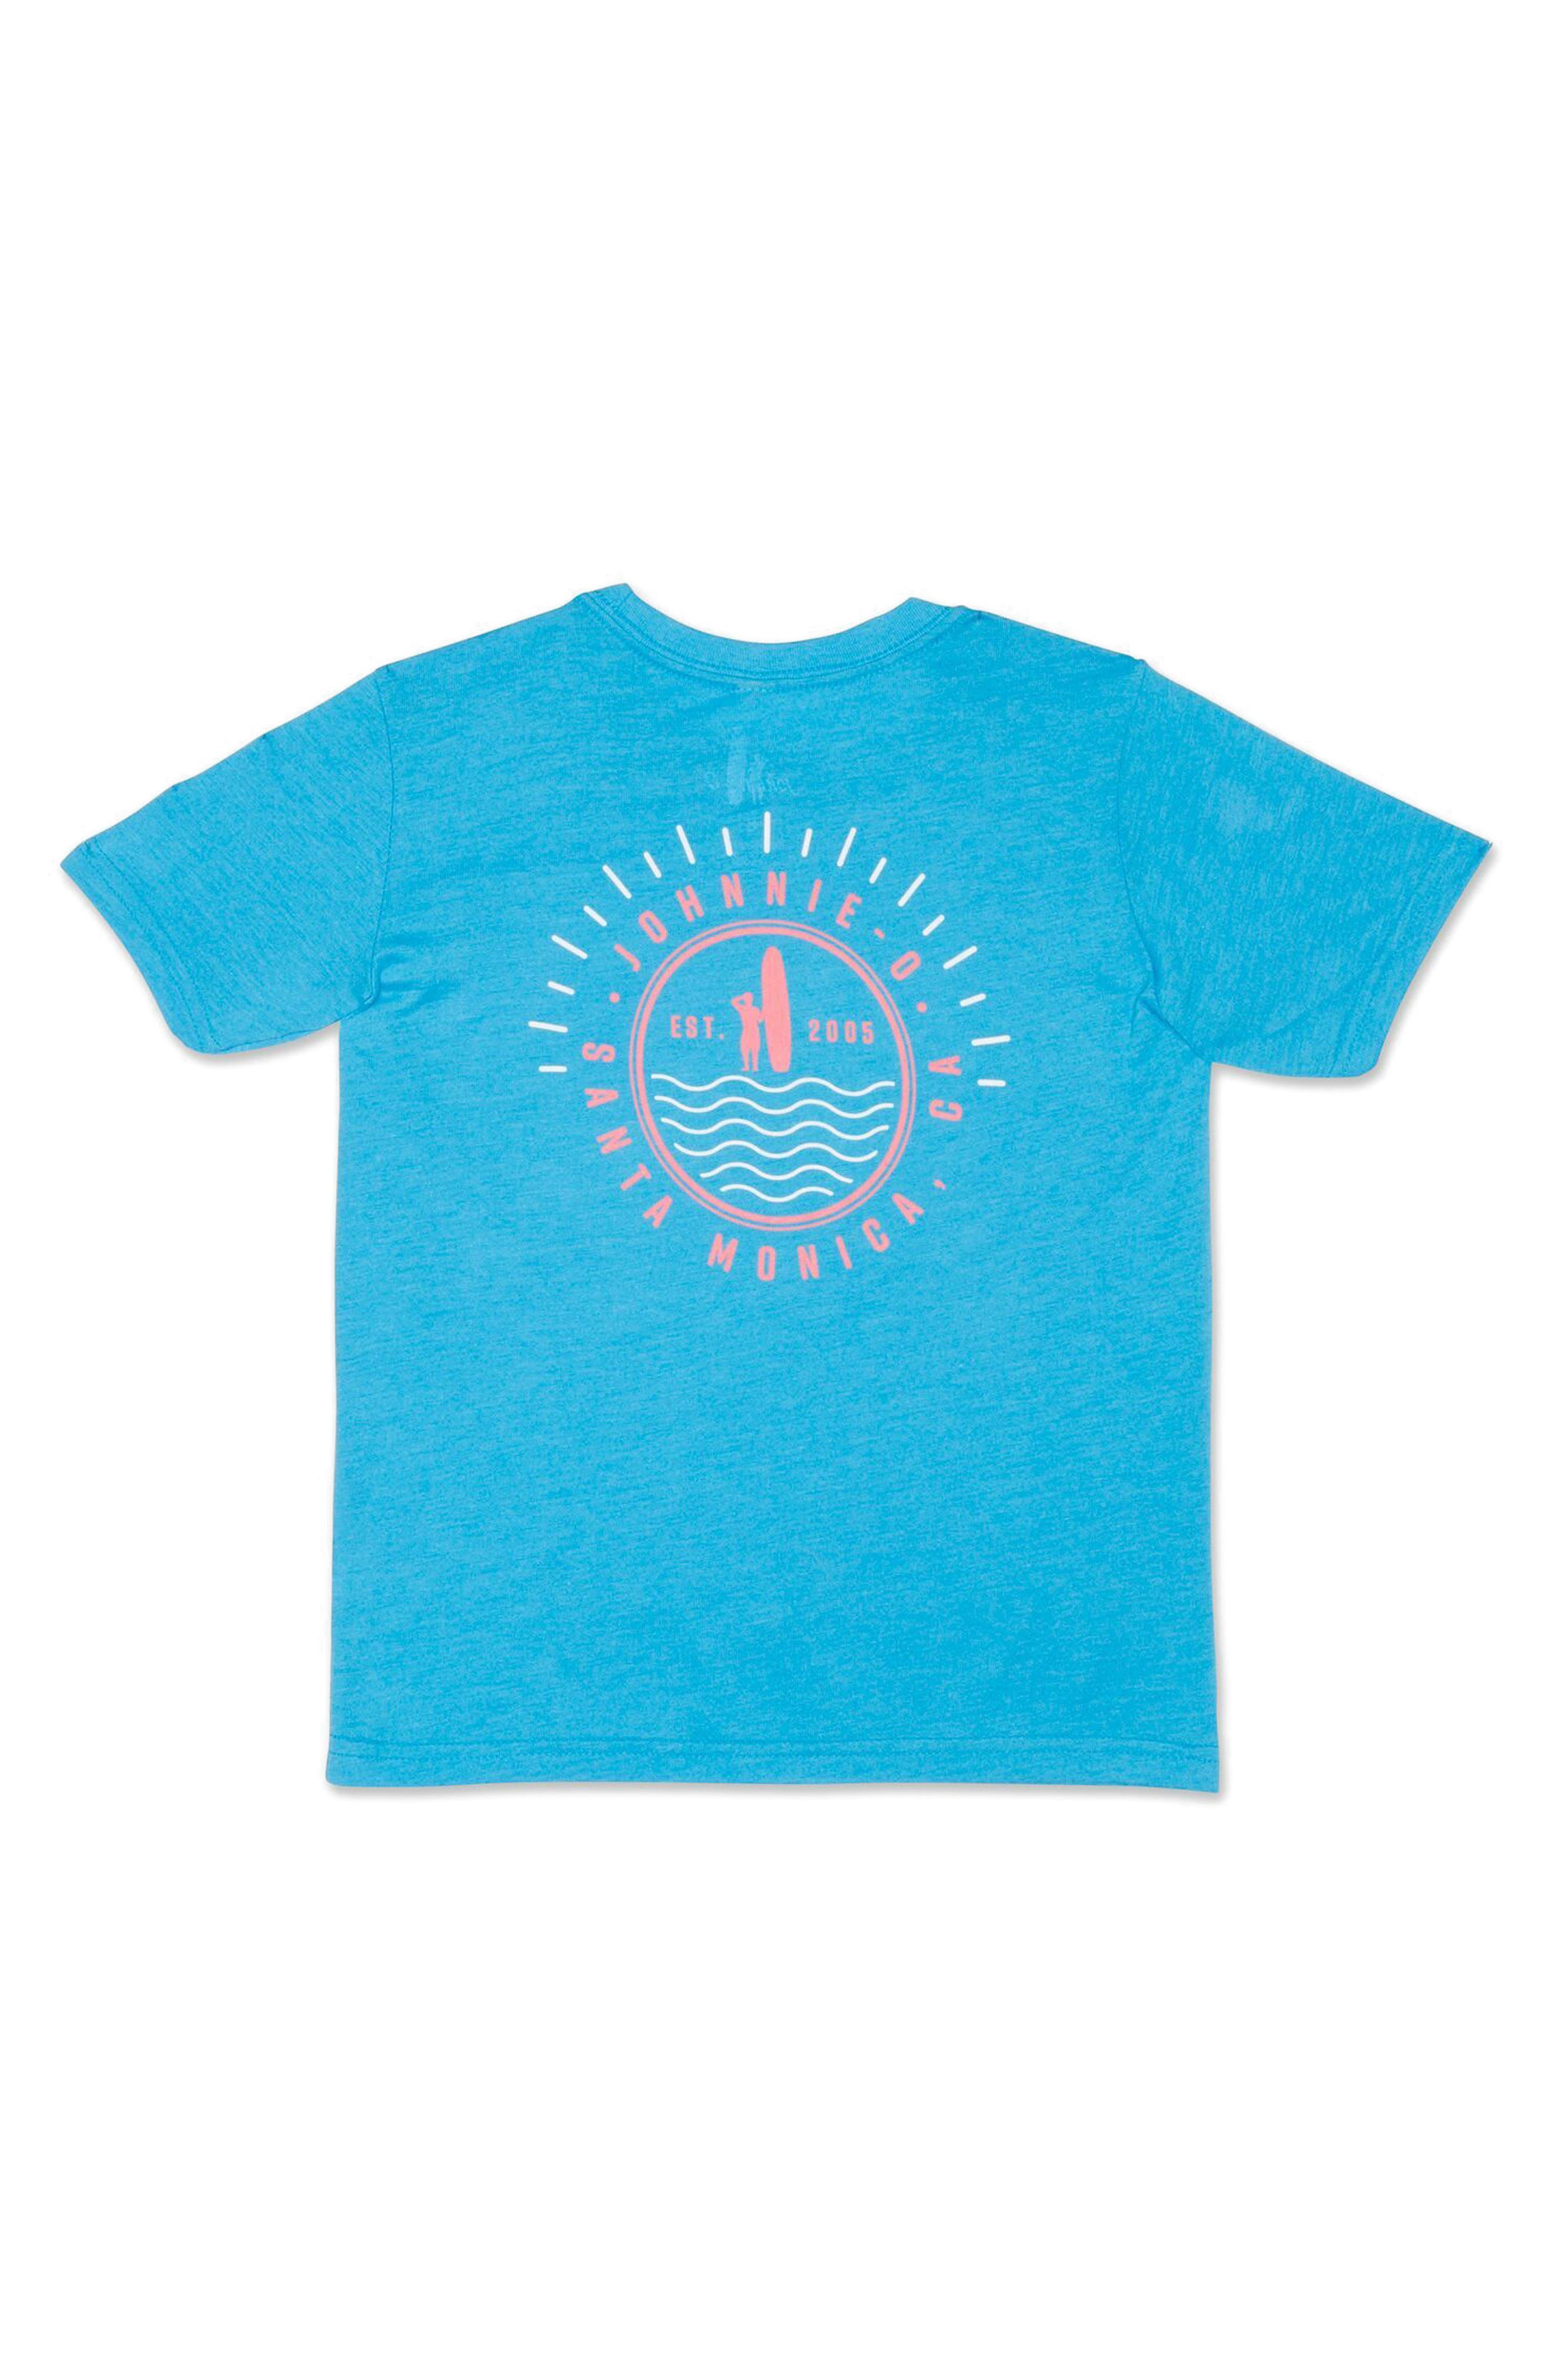 Vance T-Shirt,                             Alternate thumbnail 2, color,                             Cayman